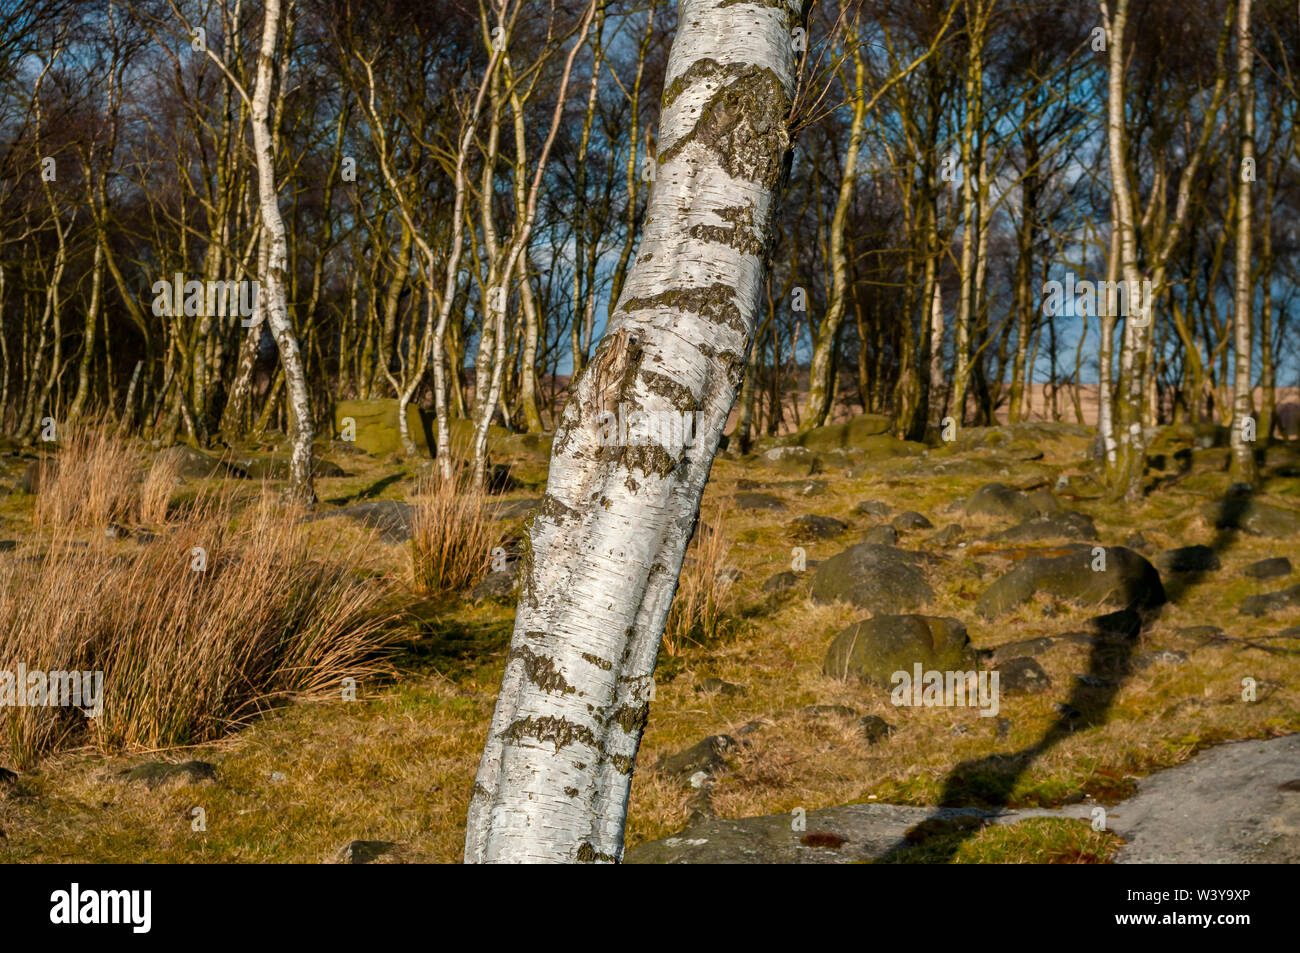 Silver Birch trees in bright sunshine at Gardom's Edge, near Baslow, Derbyshire Stock Photo